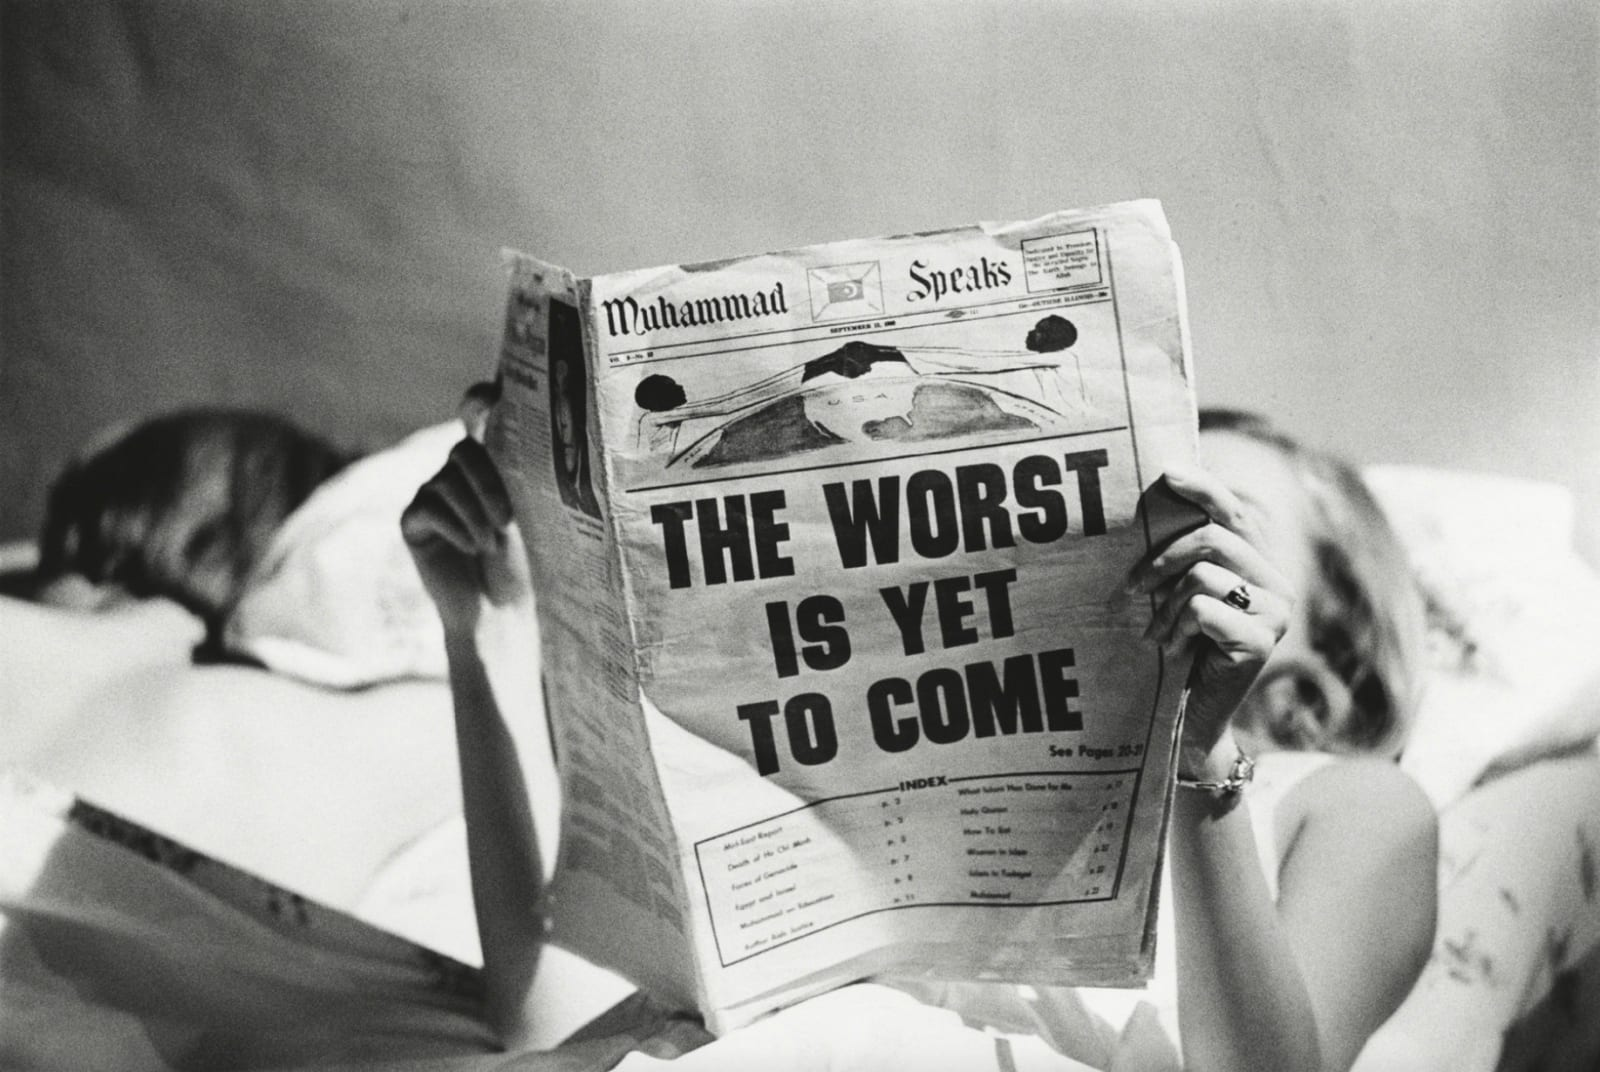 Steve Schapiro The Worst Is Yet to Come, New York, 1968